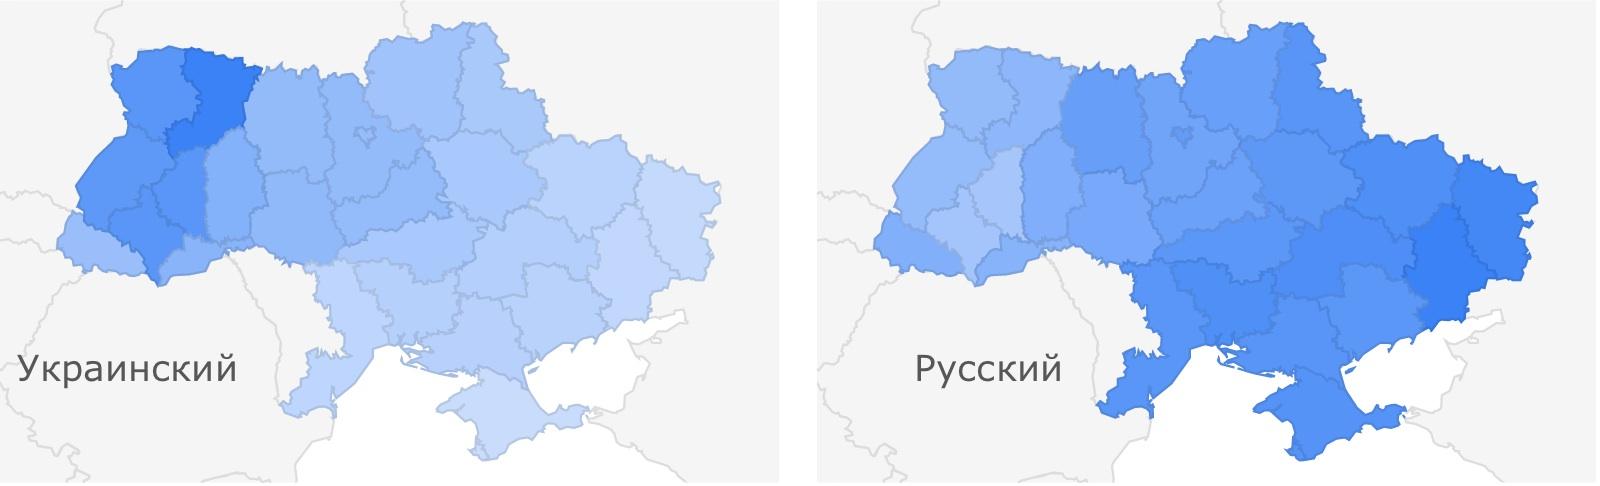 http://neogeography.ru/rus/images/ordinary/image_4_ukr_rus_1600_486.jpg